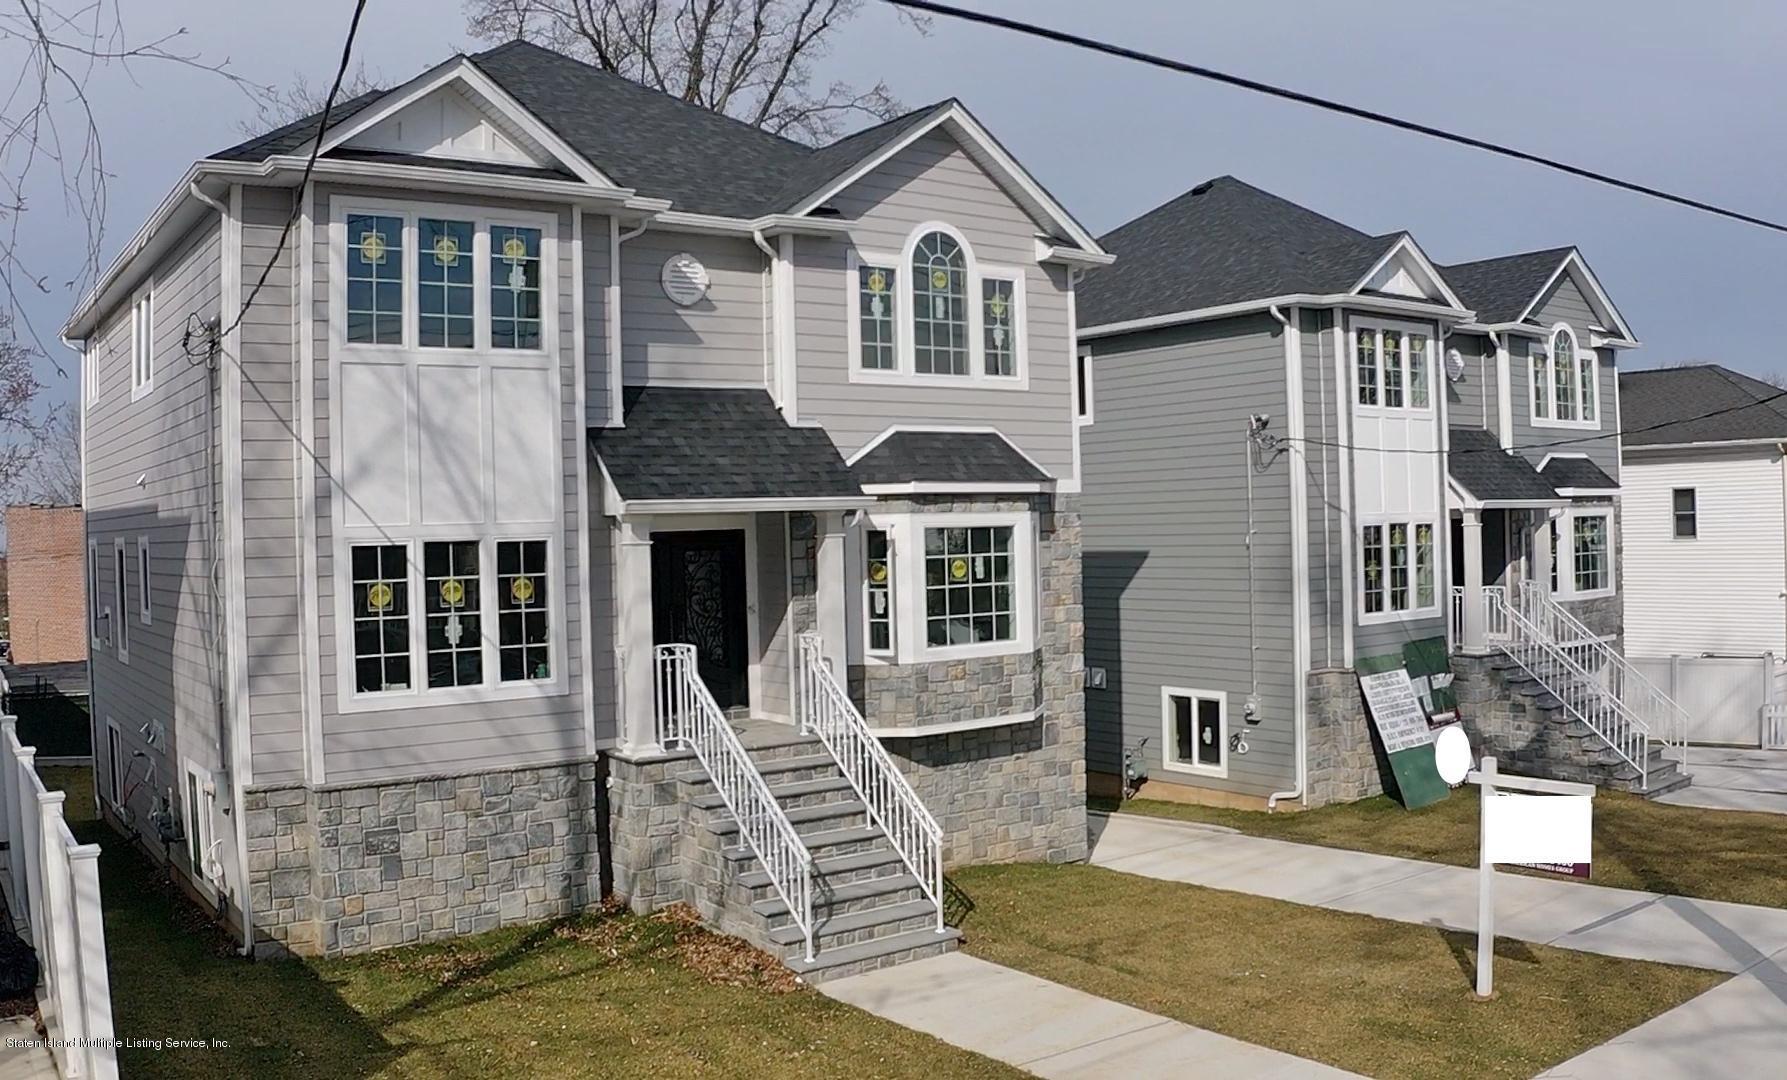 Single Family - Detached 170 Fairview Avenue  Staten Island, NY 10314, MLS-1126684-9